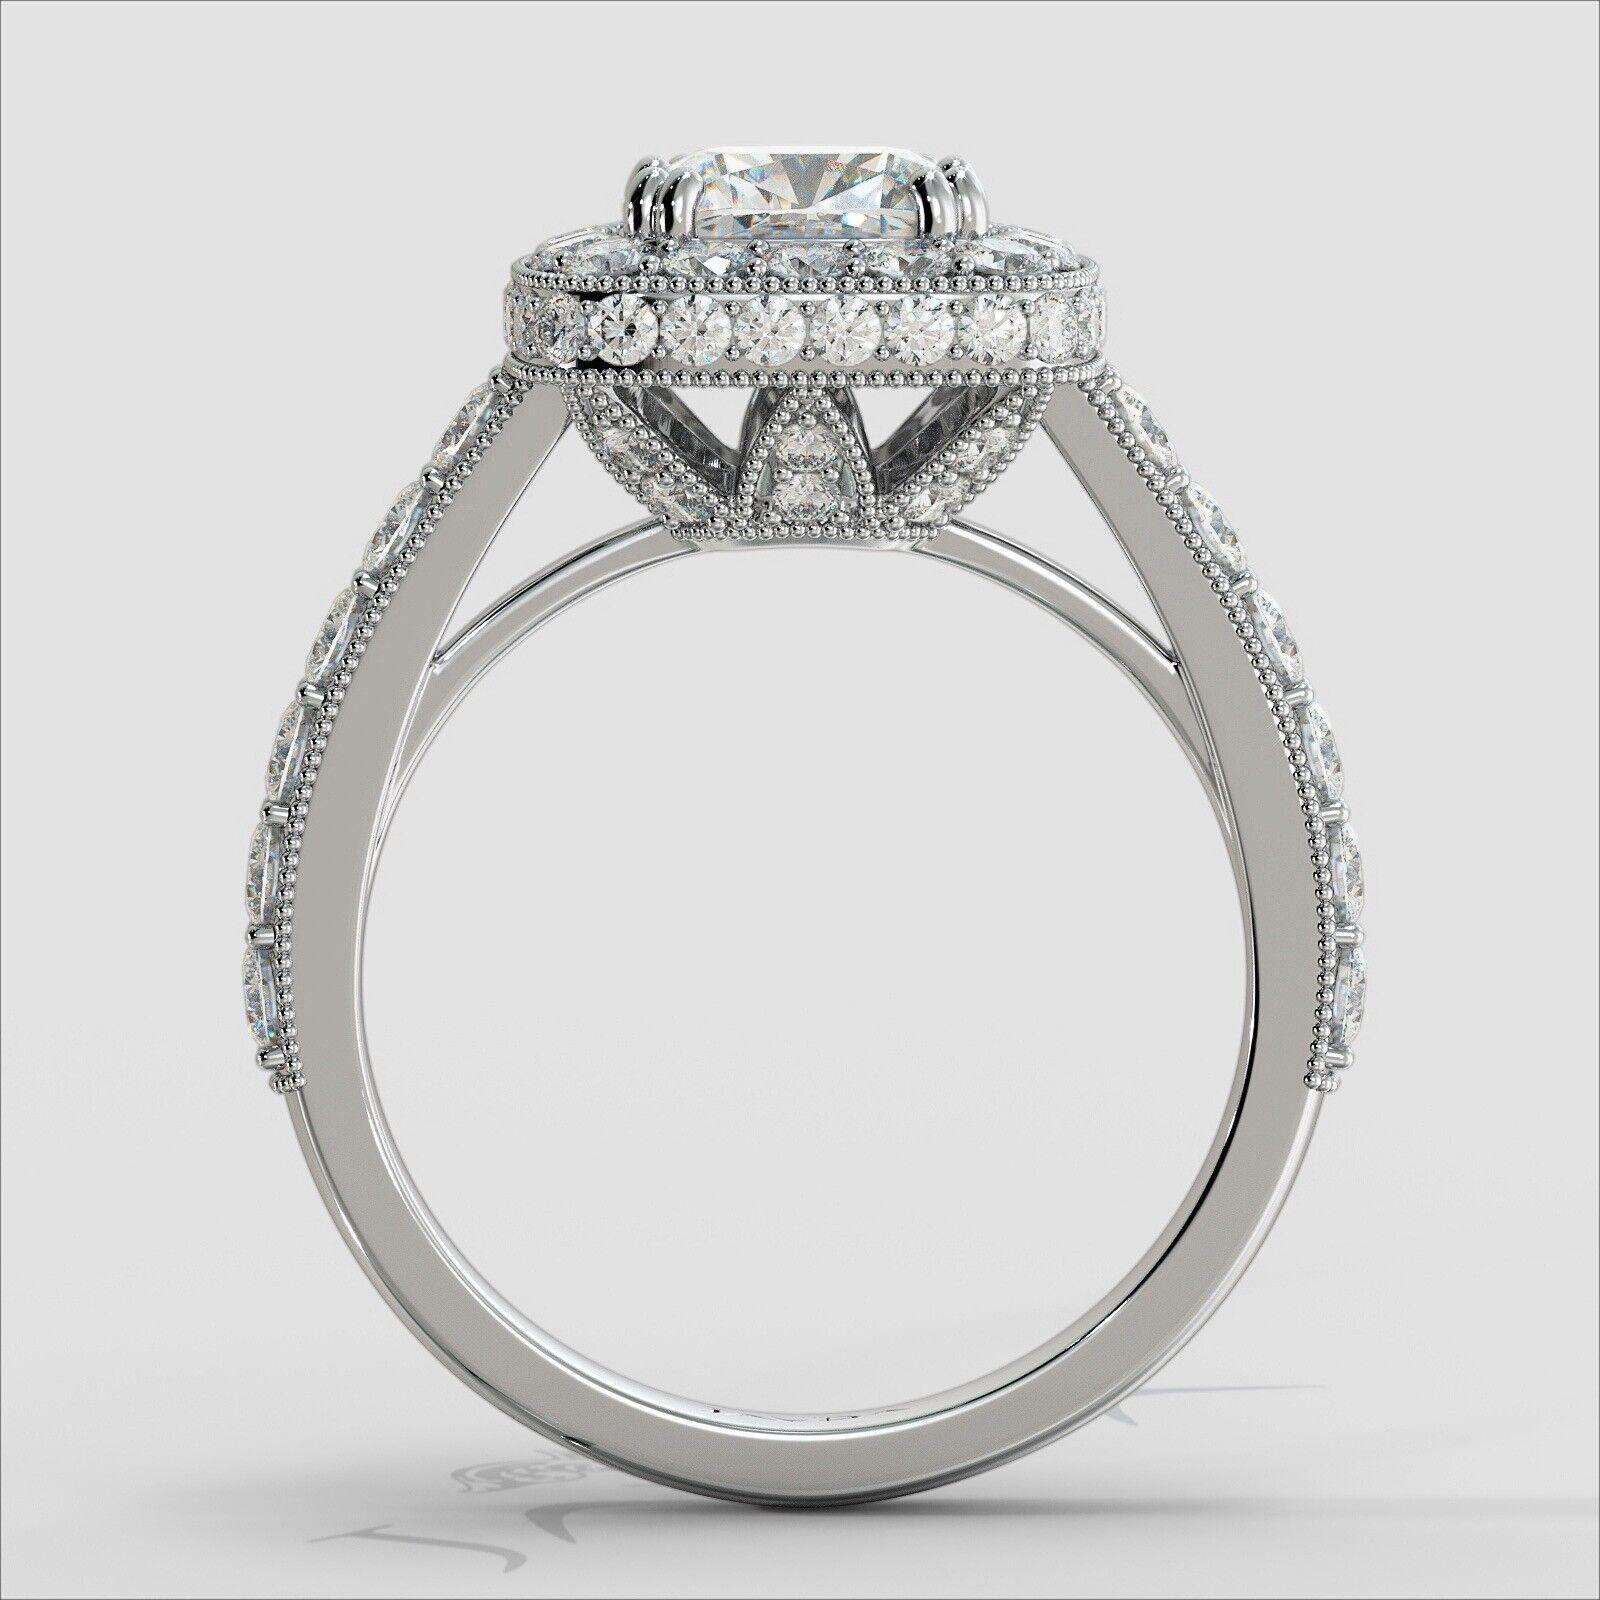 2ctw Milgrain Halo Floral Basket Cushion Diamond Engagement Ring GIA H-VS2 Gold 3